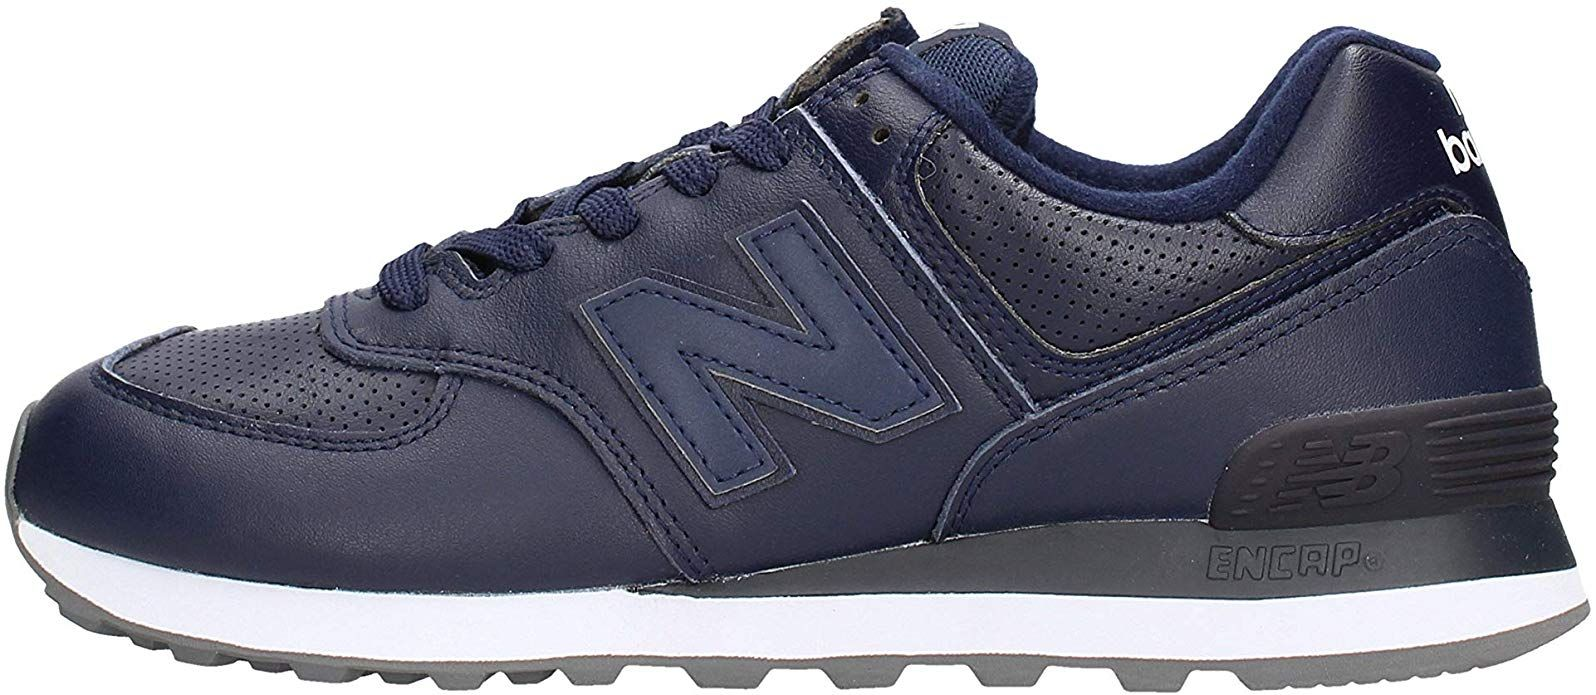 New Balance 574v2 Sneakers Herren Blau (Navy/White) (mit ...